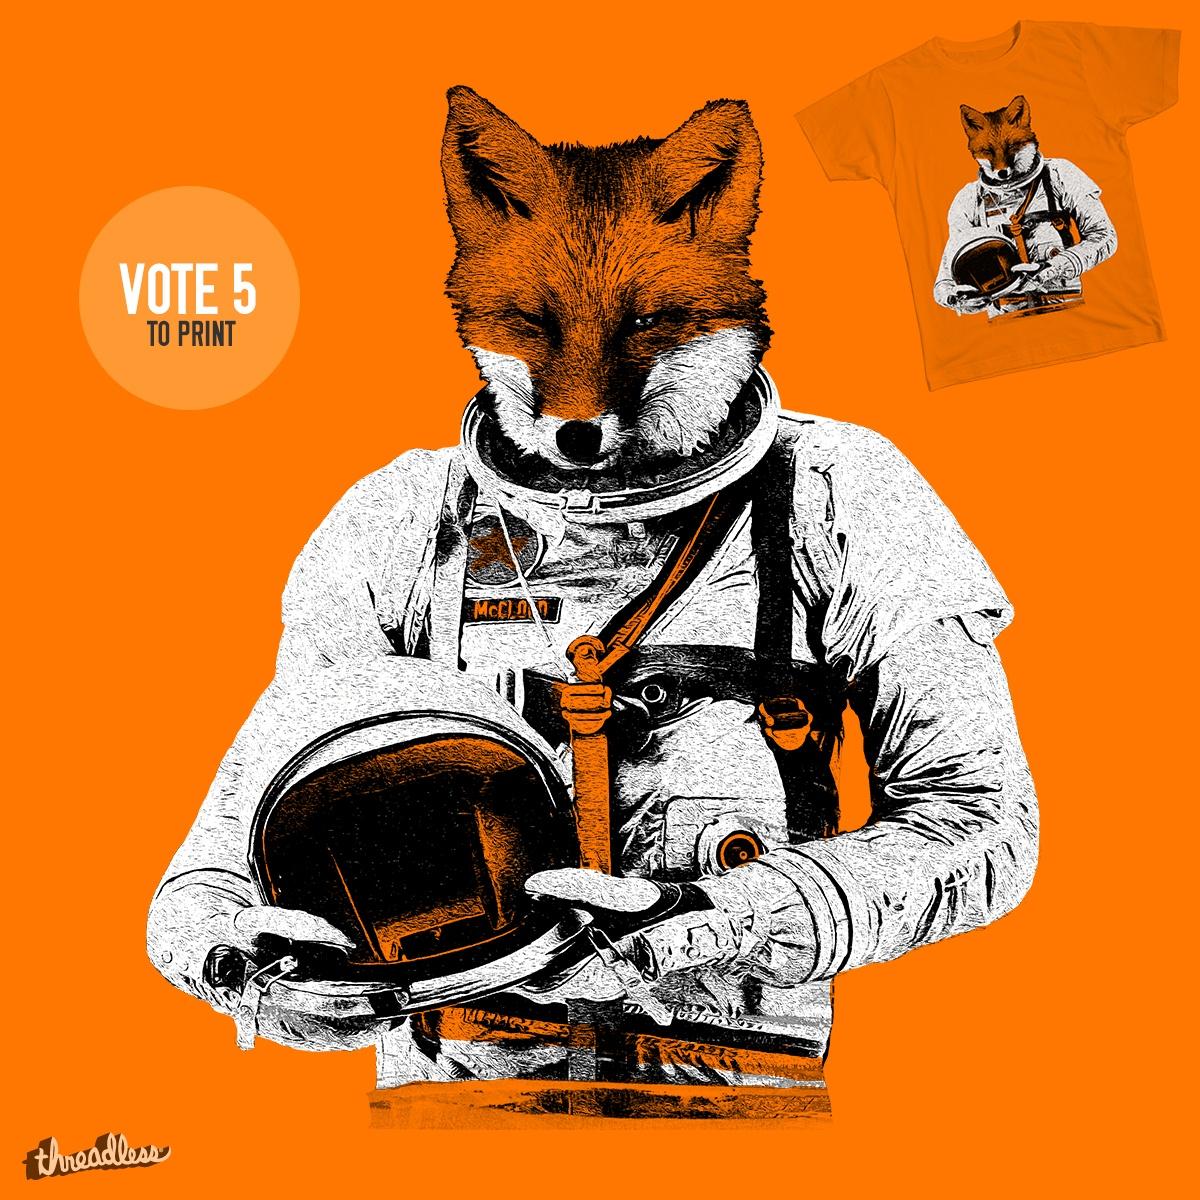 The Fastest Fox by Thomas Orrow on Threadless